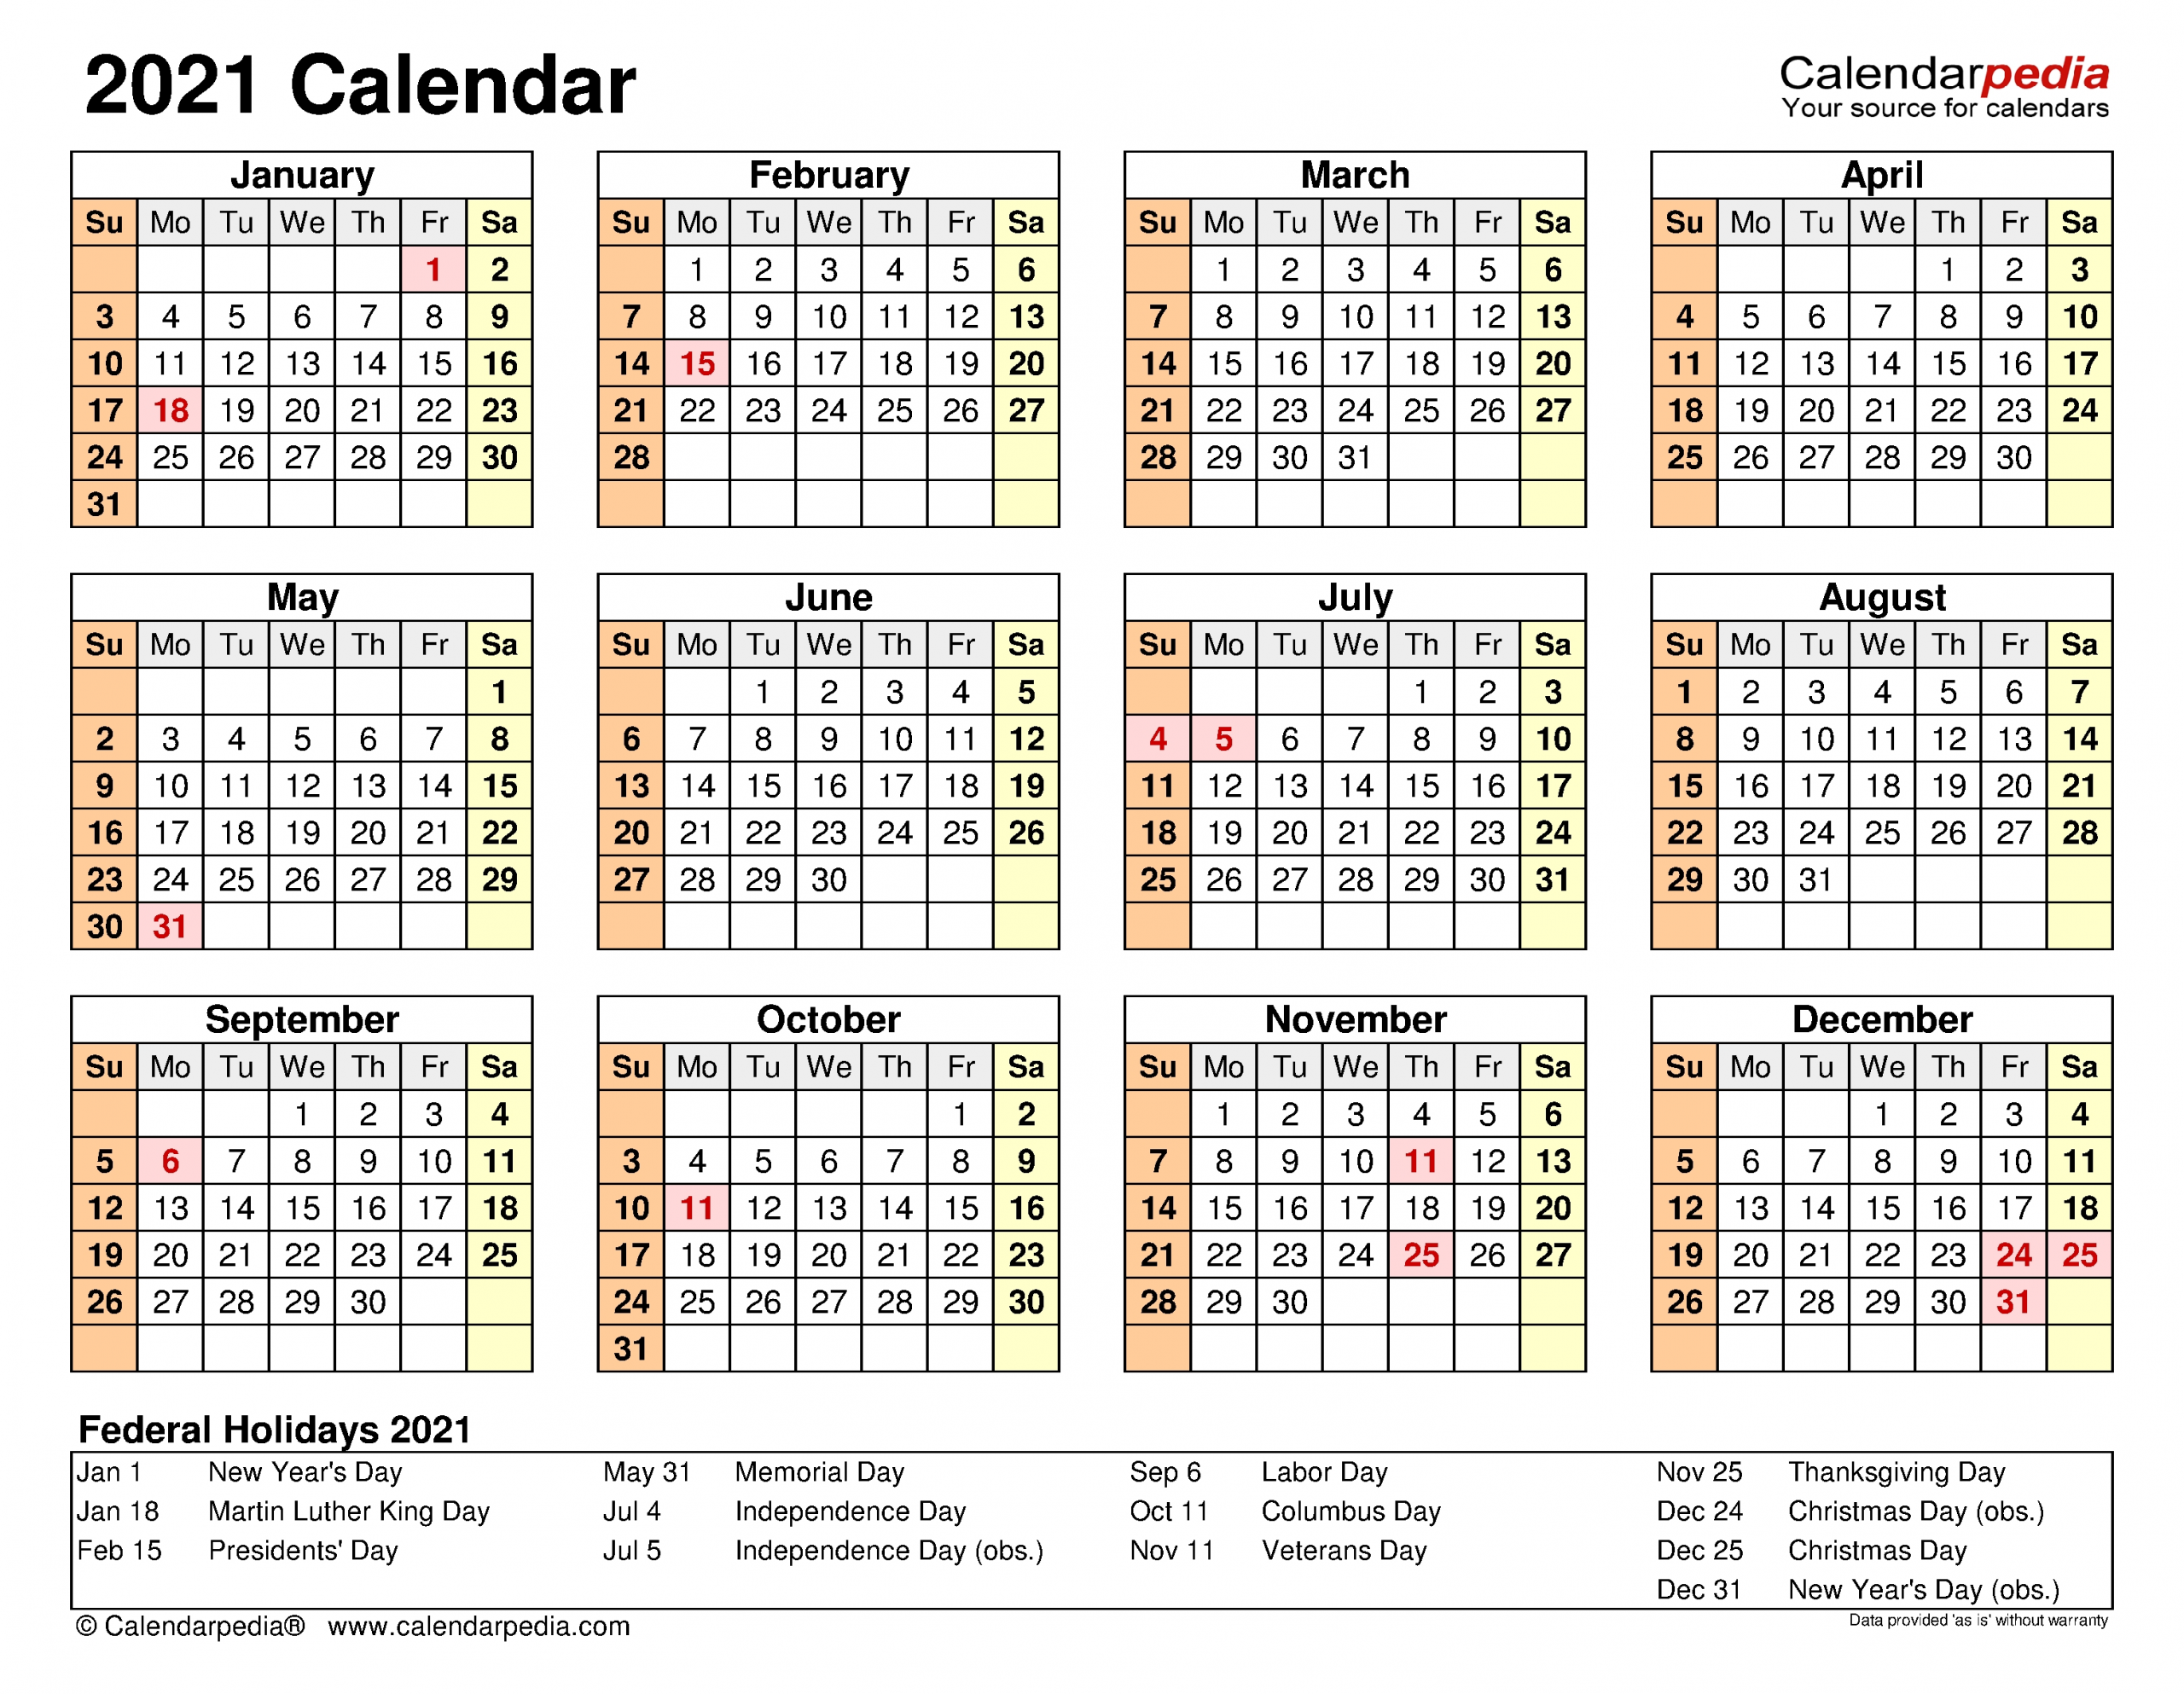 2021 Calendar - Free Printable Excel Templates - Calendarpedia-Attendance Calendars 2021